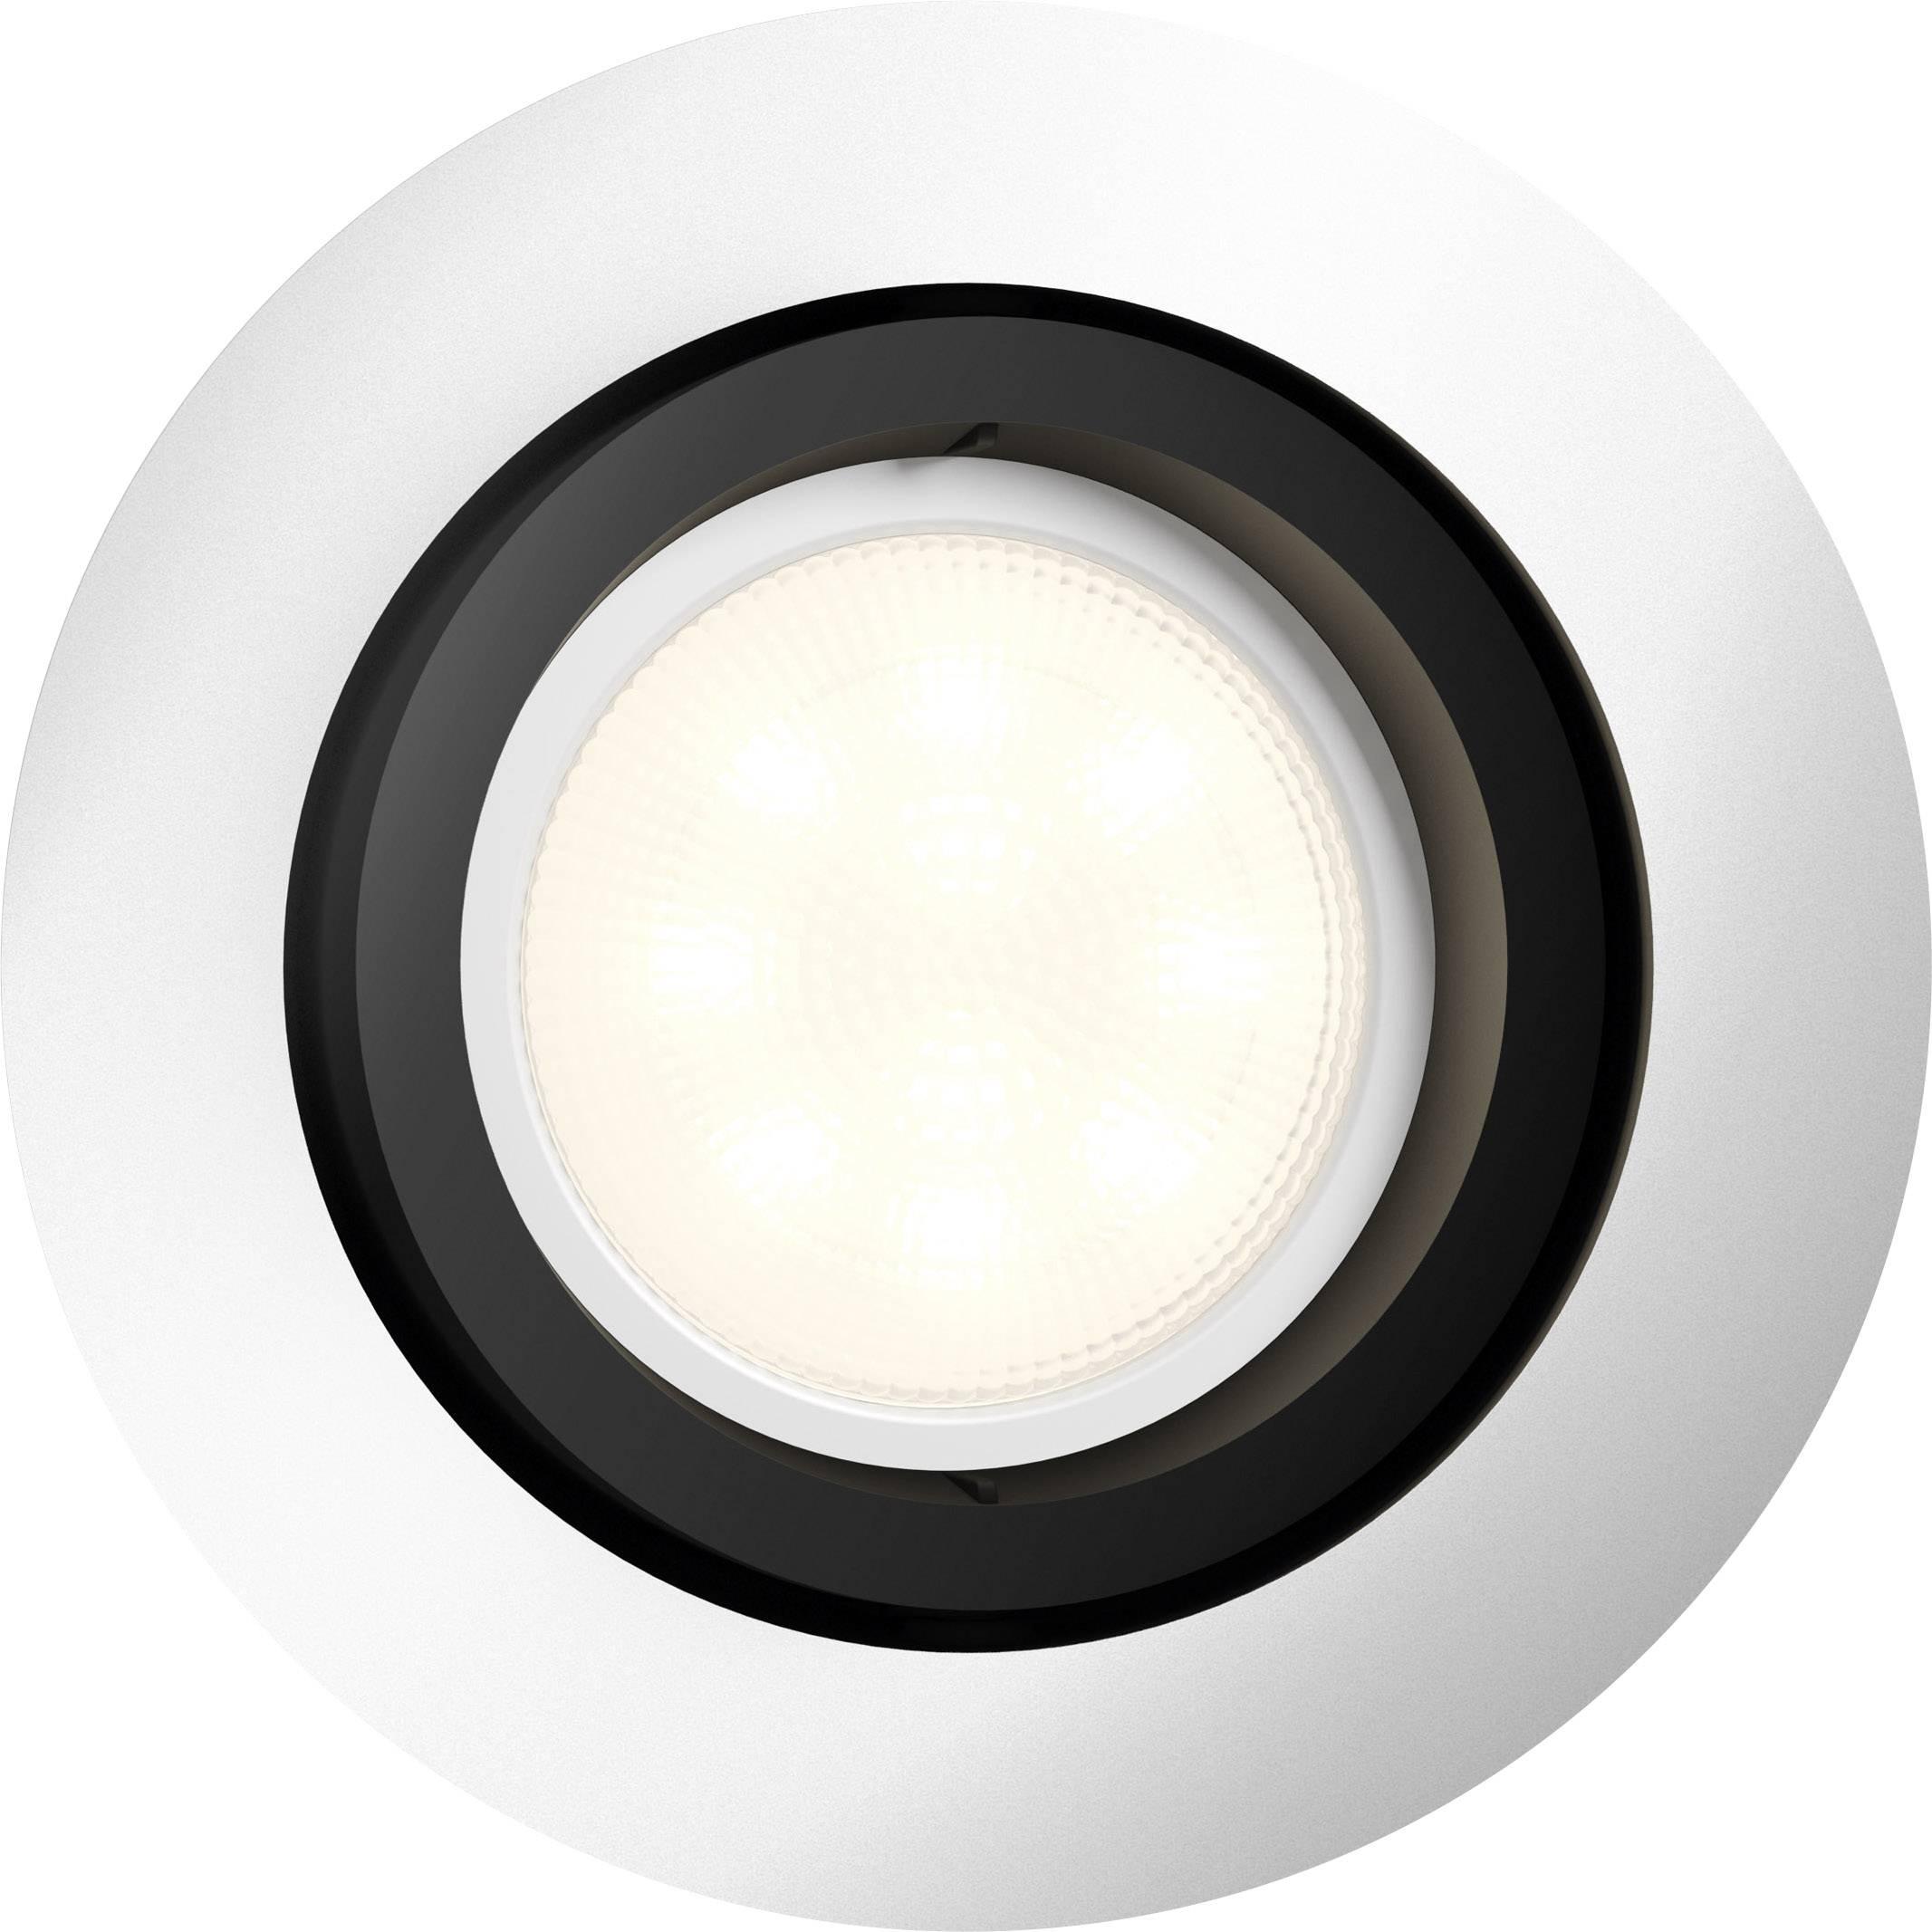 Philips Hue Lampen Gu10.Philips Lighting Hue Flush Mount Light Milliskin Eec A A E